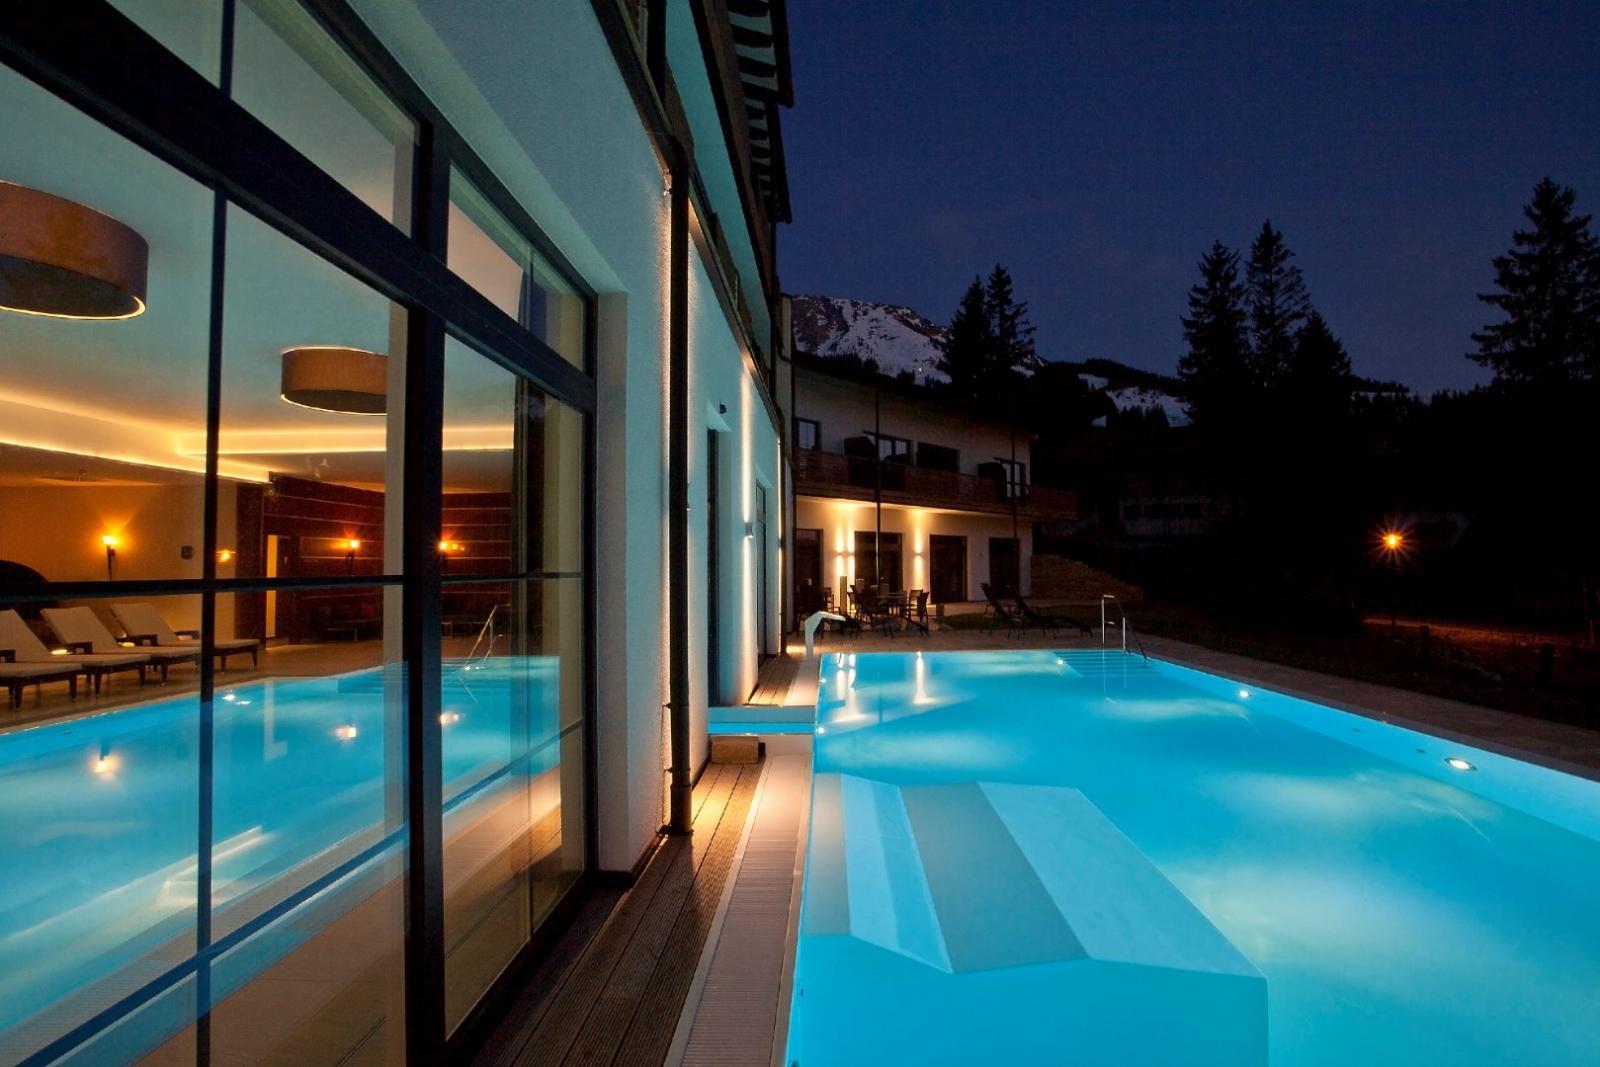 Kombucha: Foto vom Wellnesshotel Panoramahotel Oberjoch | Wellness Bayern